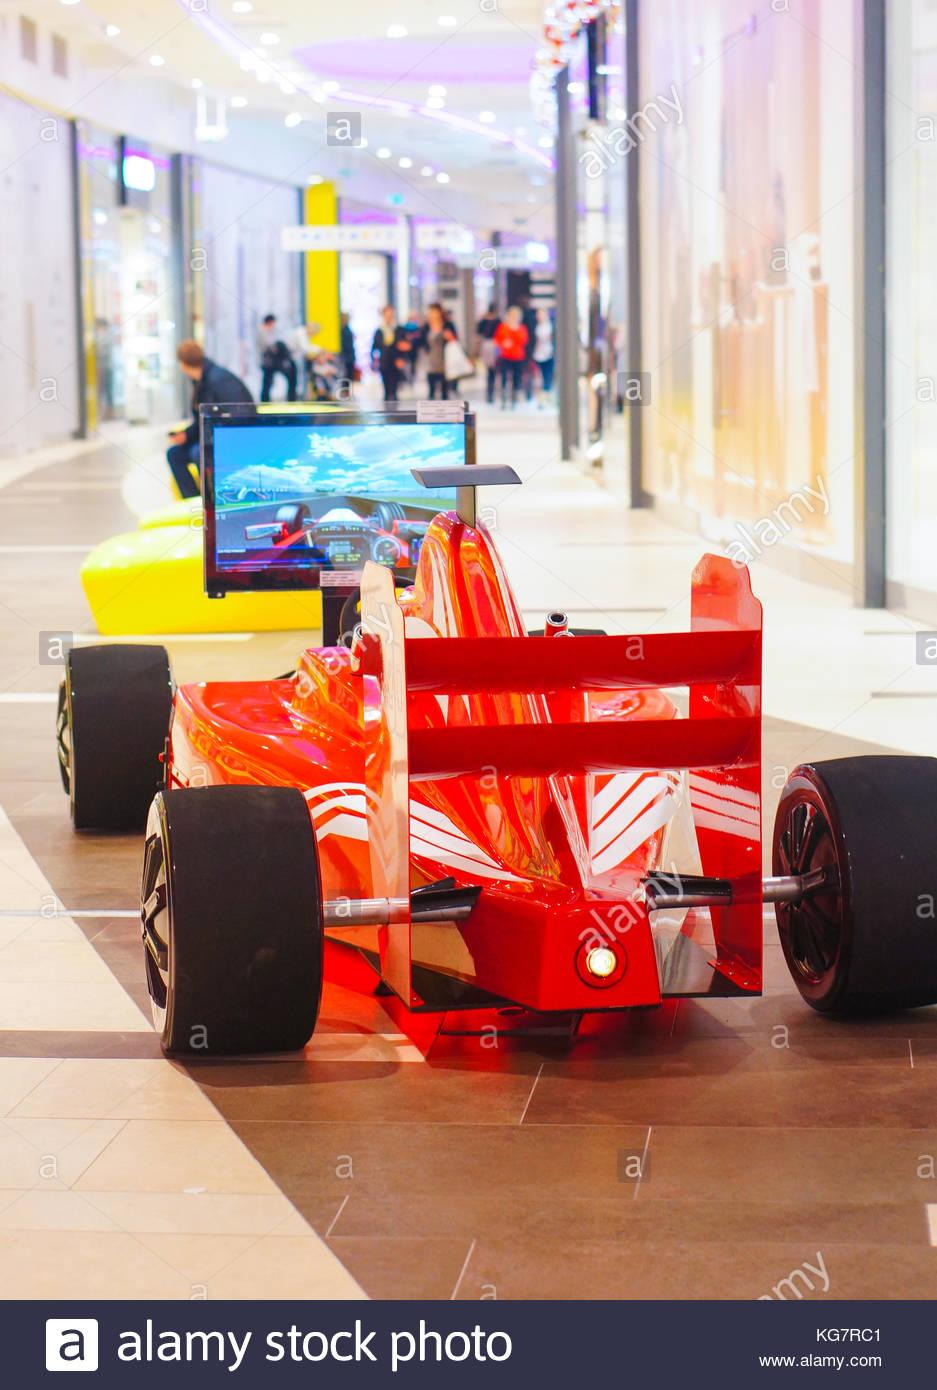 POZNAN, POLAND - JANUARY 19, 2014: Formula 1 race simulator in the Poznan City Center shopping mall - Stock Image